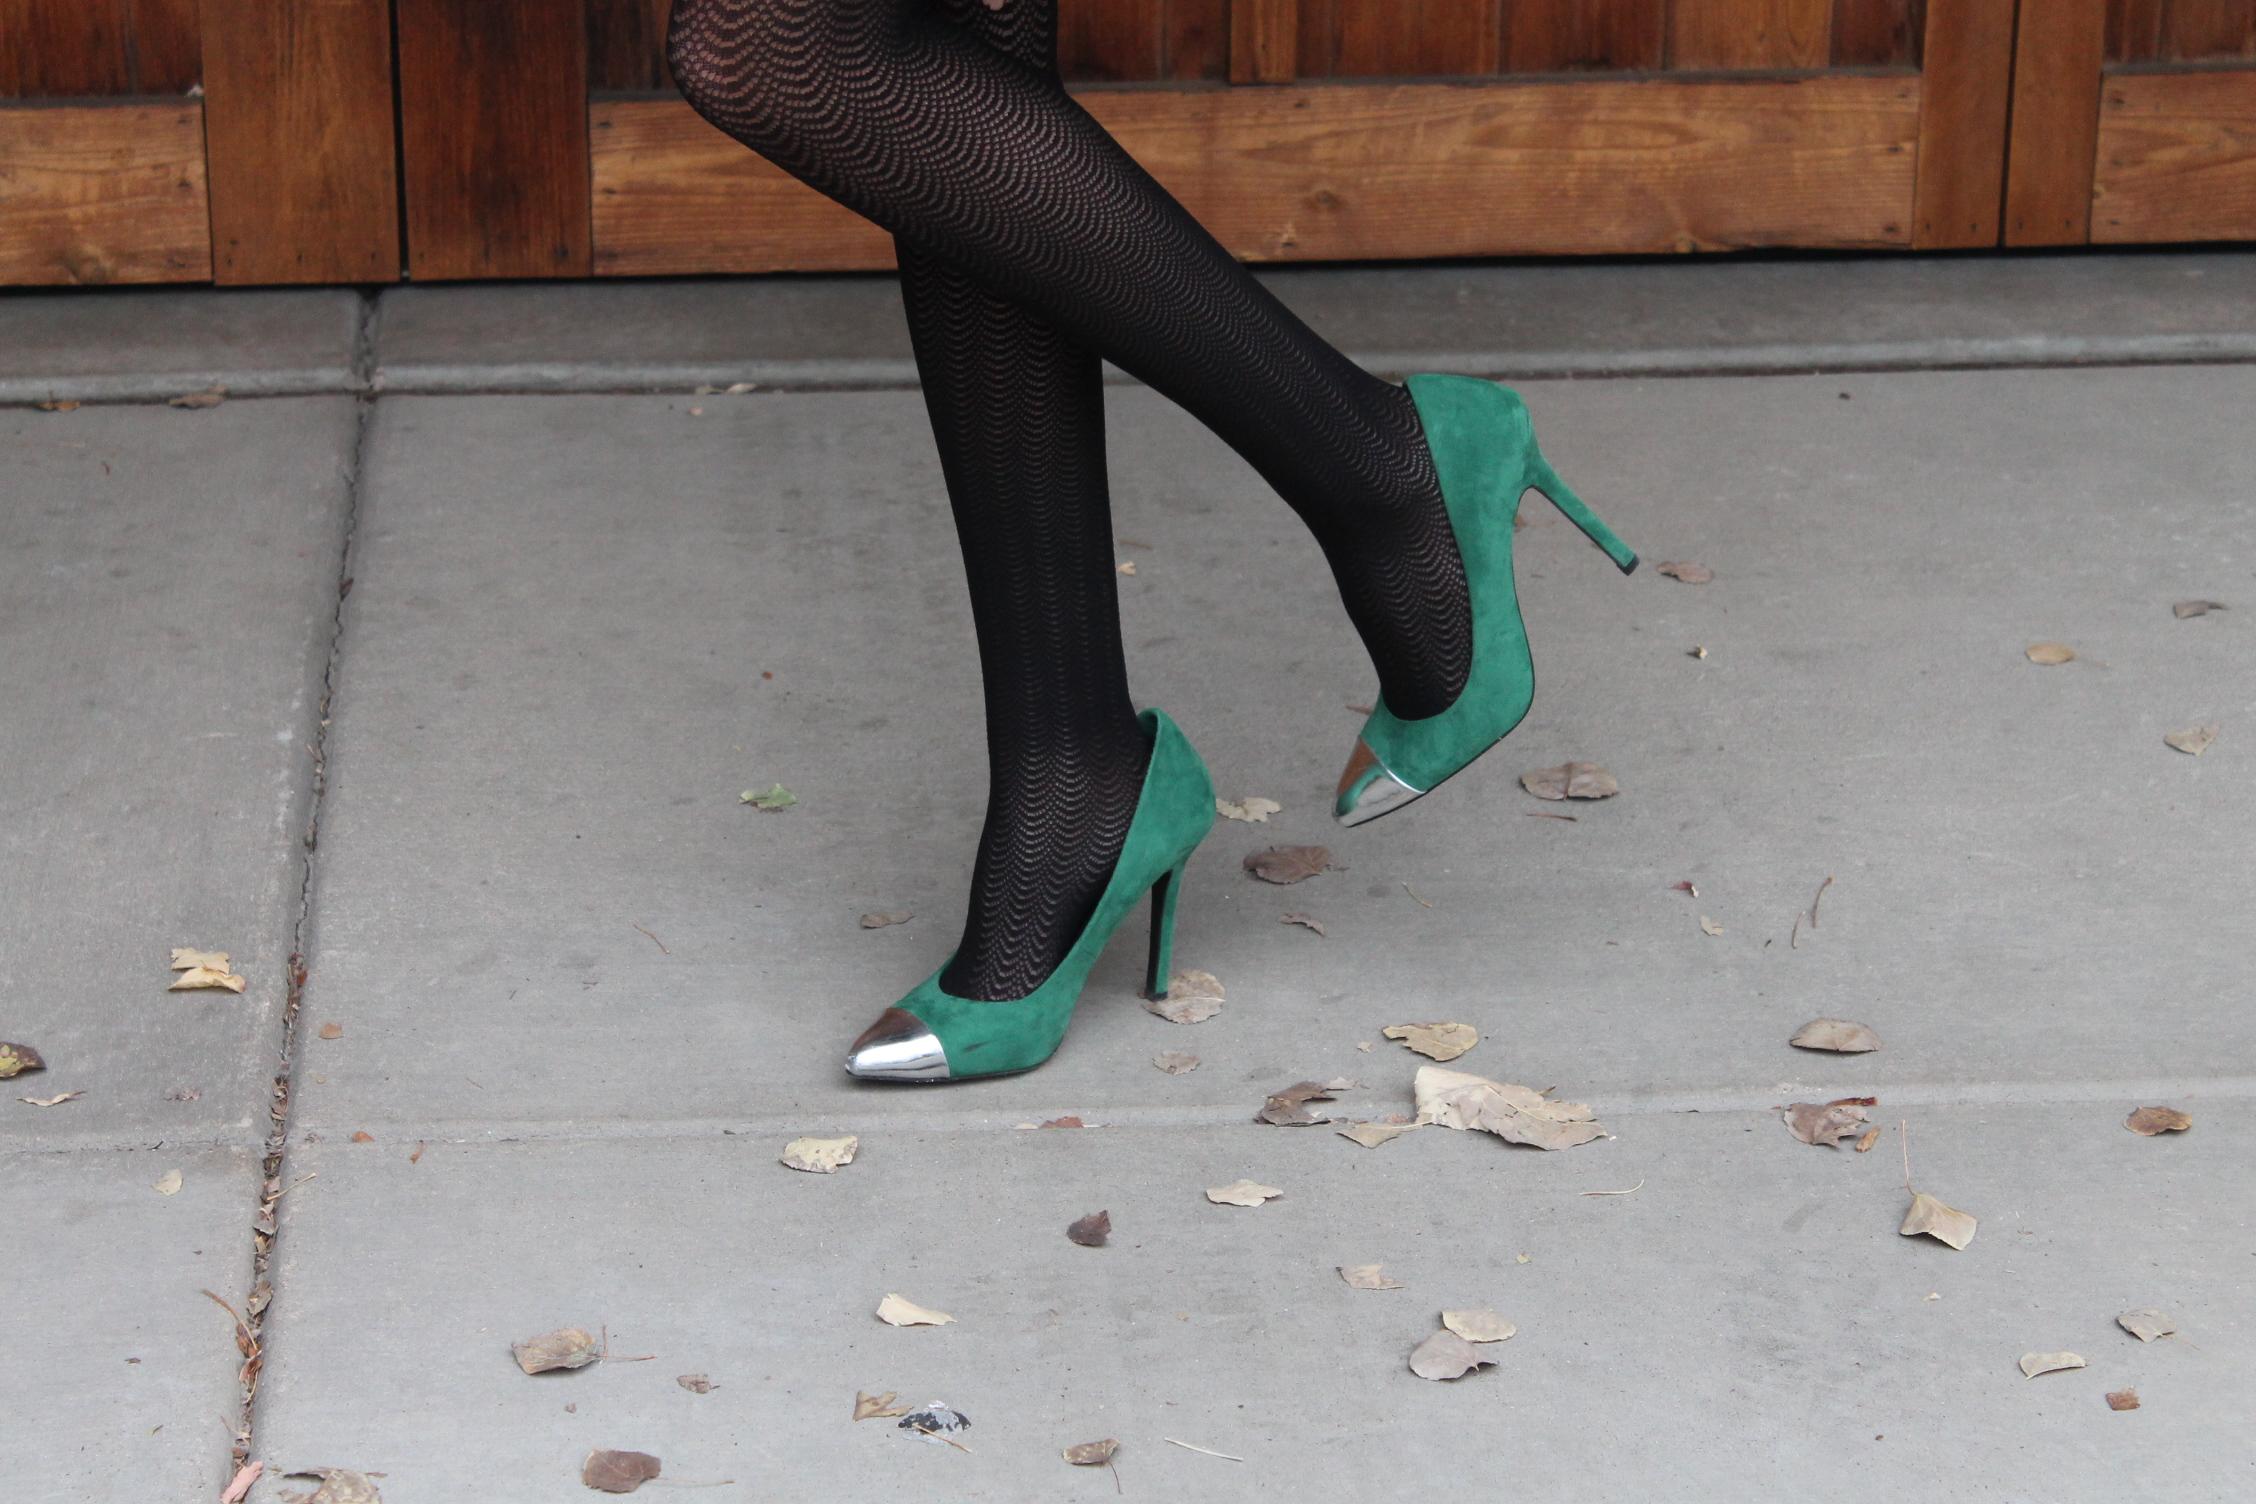 1bd6c5cd8f72 Dress: TJ Maxx Clutch: Nordstrom Tights: Target Shoes: Target